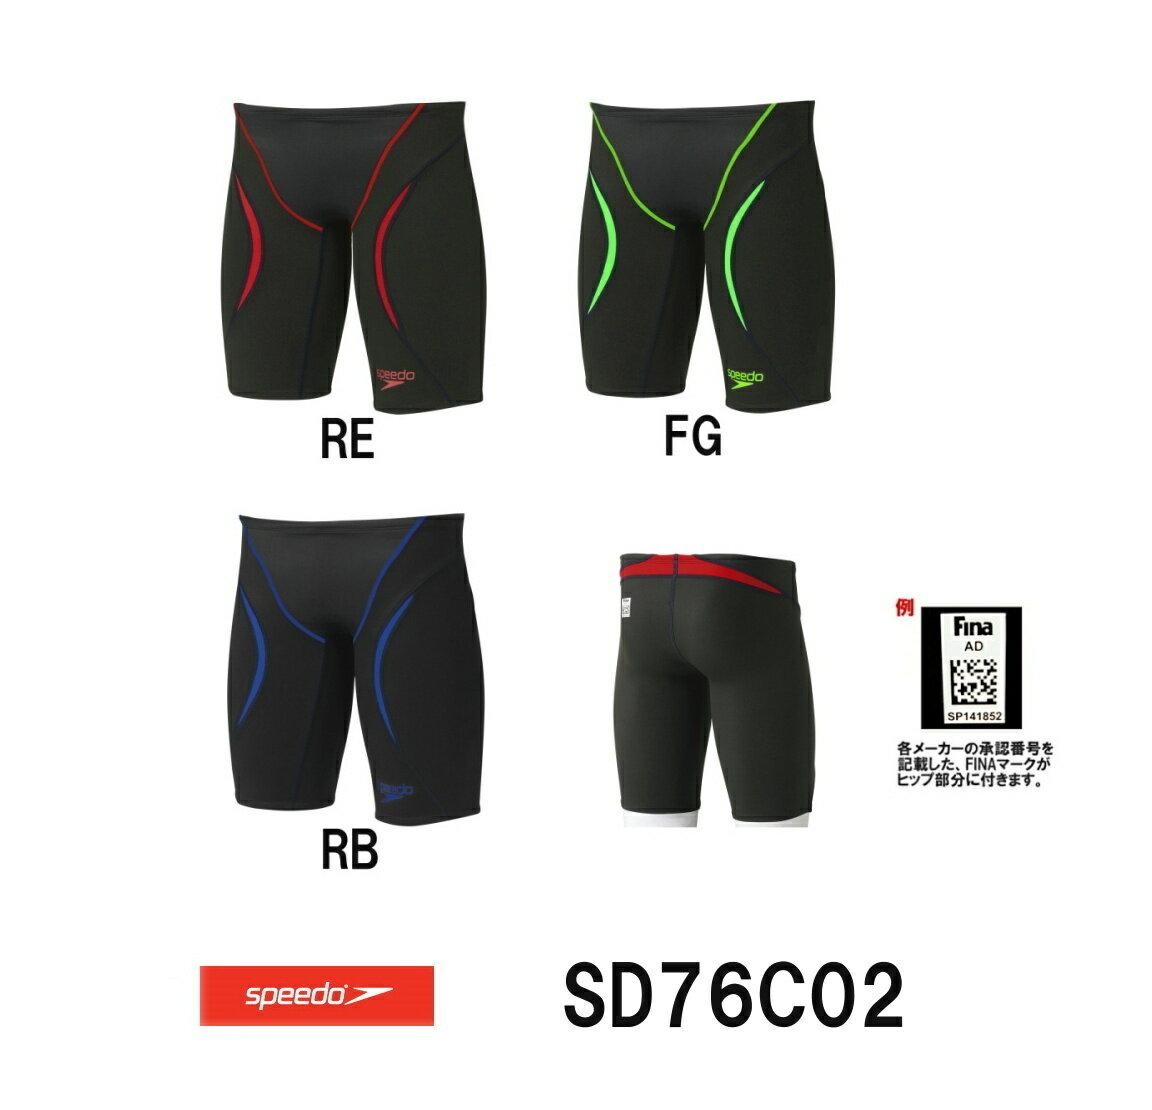 SPEEDO スピード 競泳水着 Fastskin XT Active Hybrid2 メンズ スイムウェア スイミング 男性用メンズジャマー SD76C02-HK